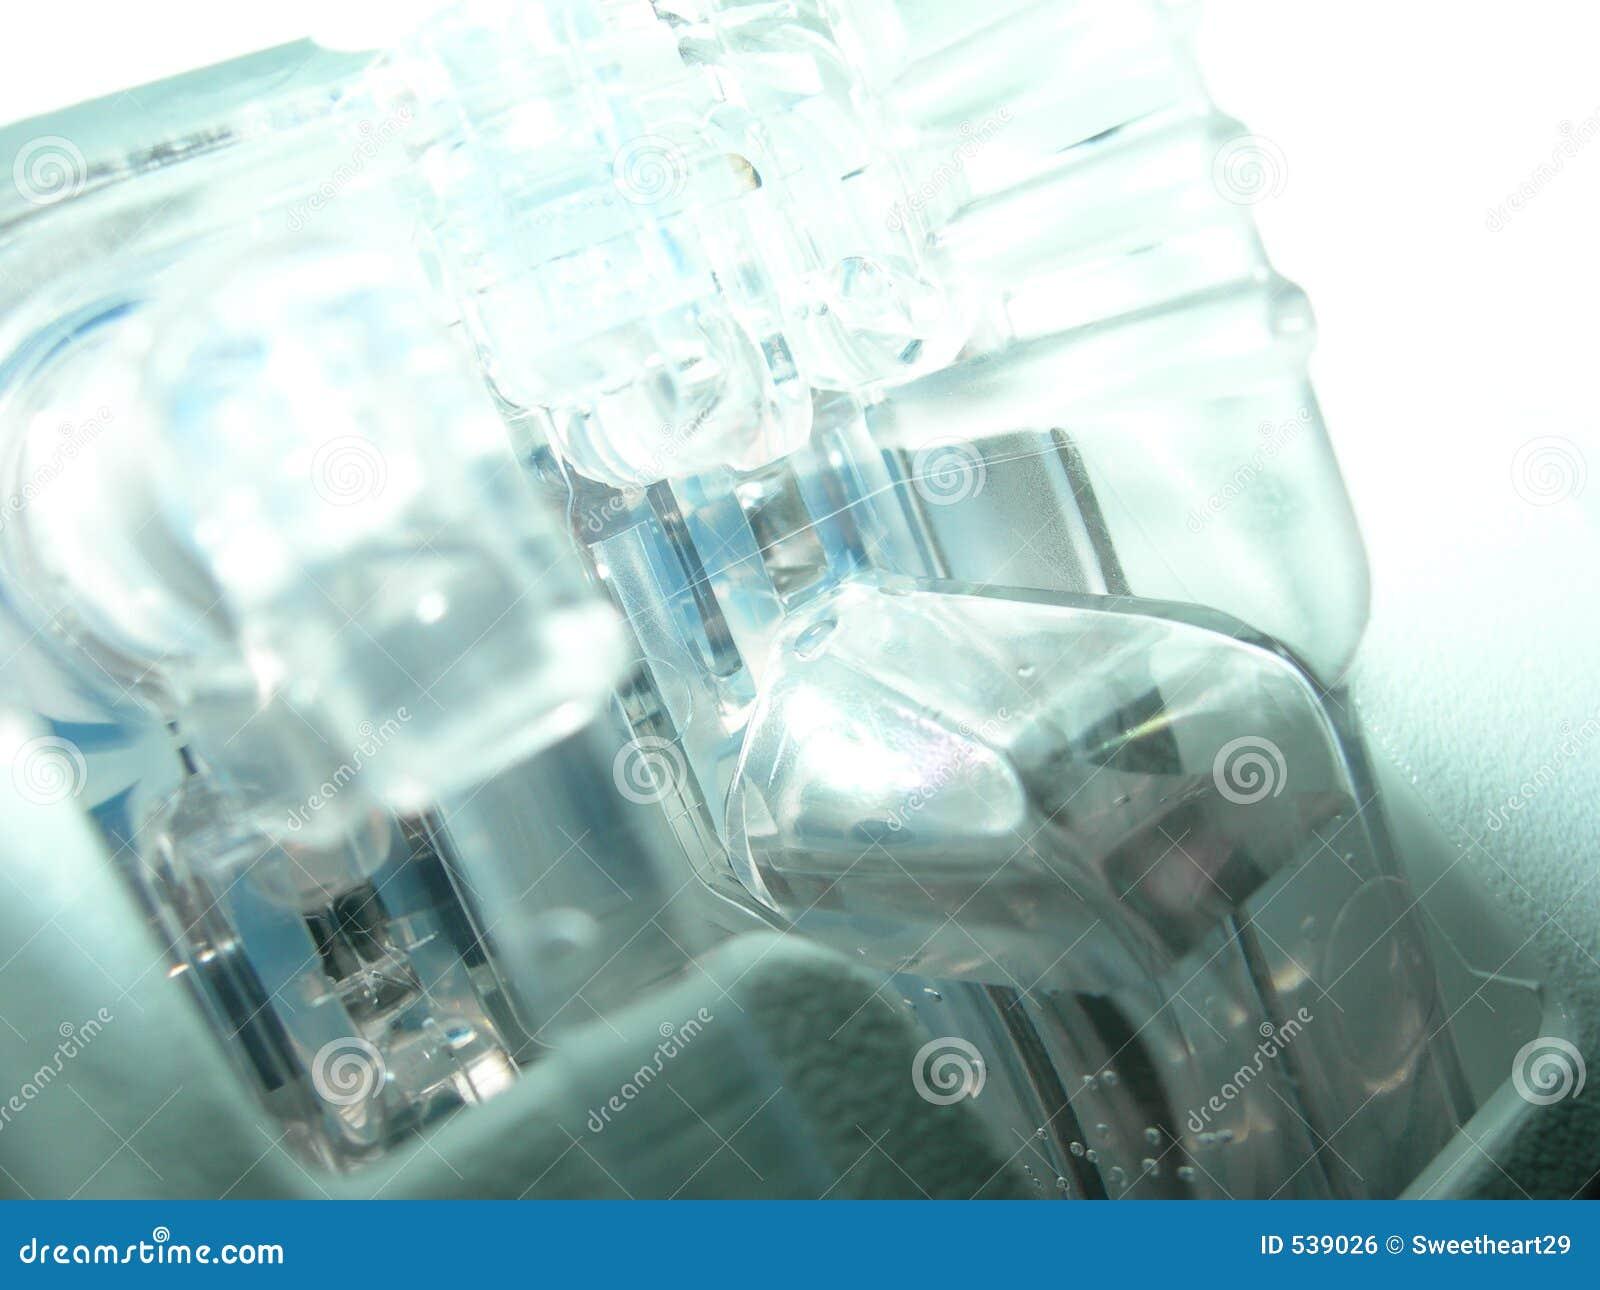 Download 管 库存照片. 图片 包括有 医疗保障, 精神创伤, 医疗补助, 医院, 蓝色, 荒地, 医疗, 管材, 商业 - 539026